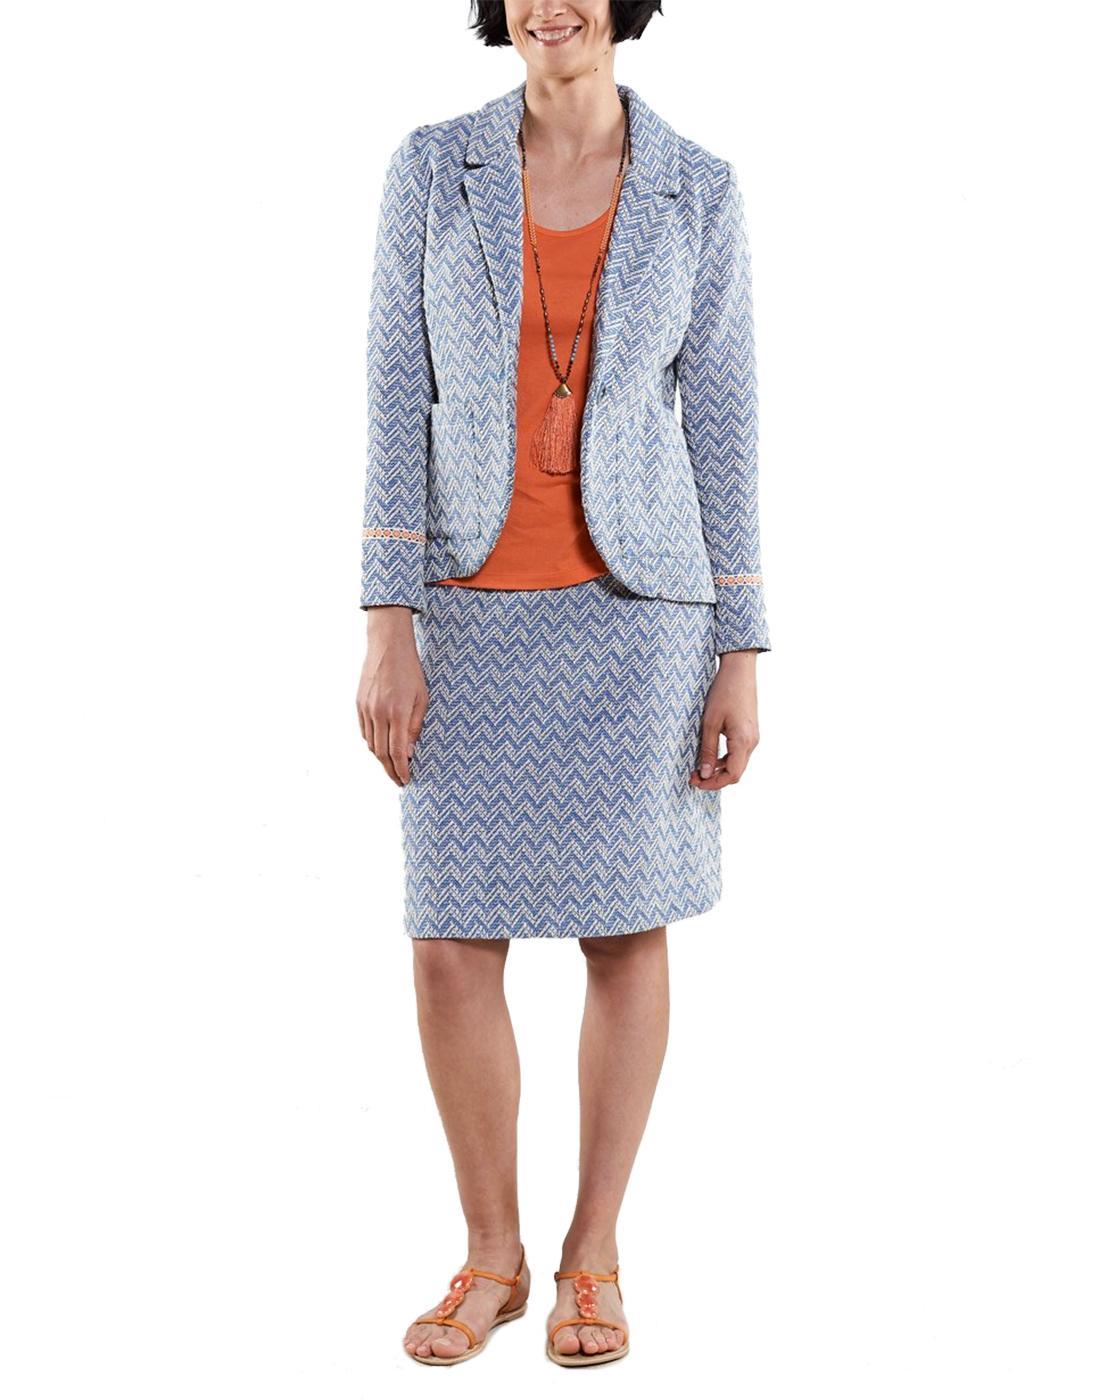 NOMADS Womens Retro Handloom Tailored Skirt Suit